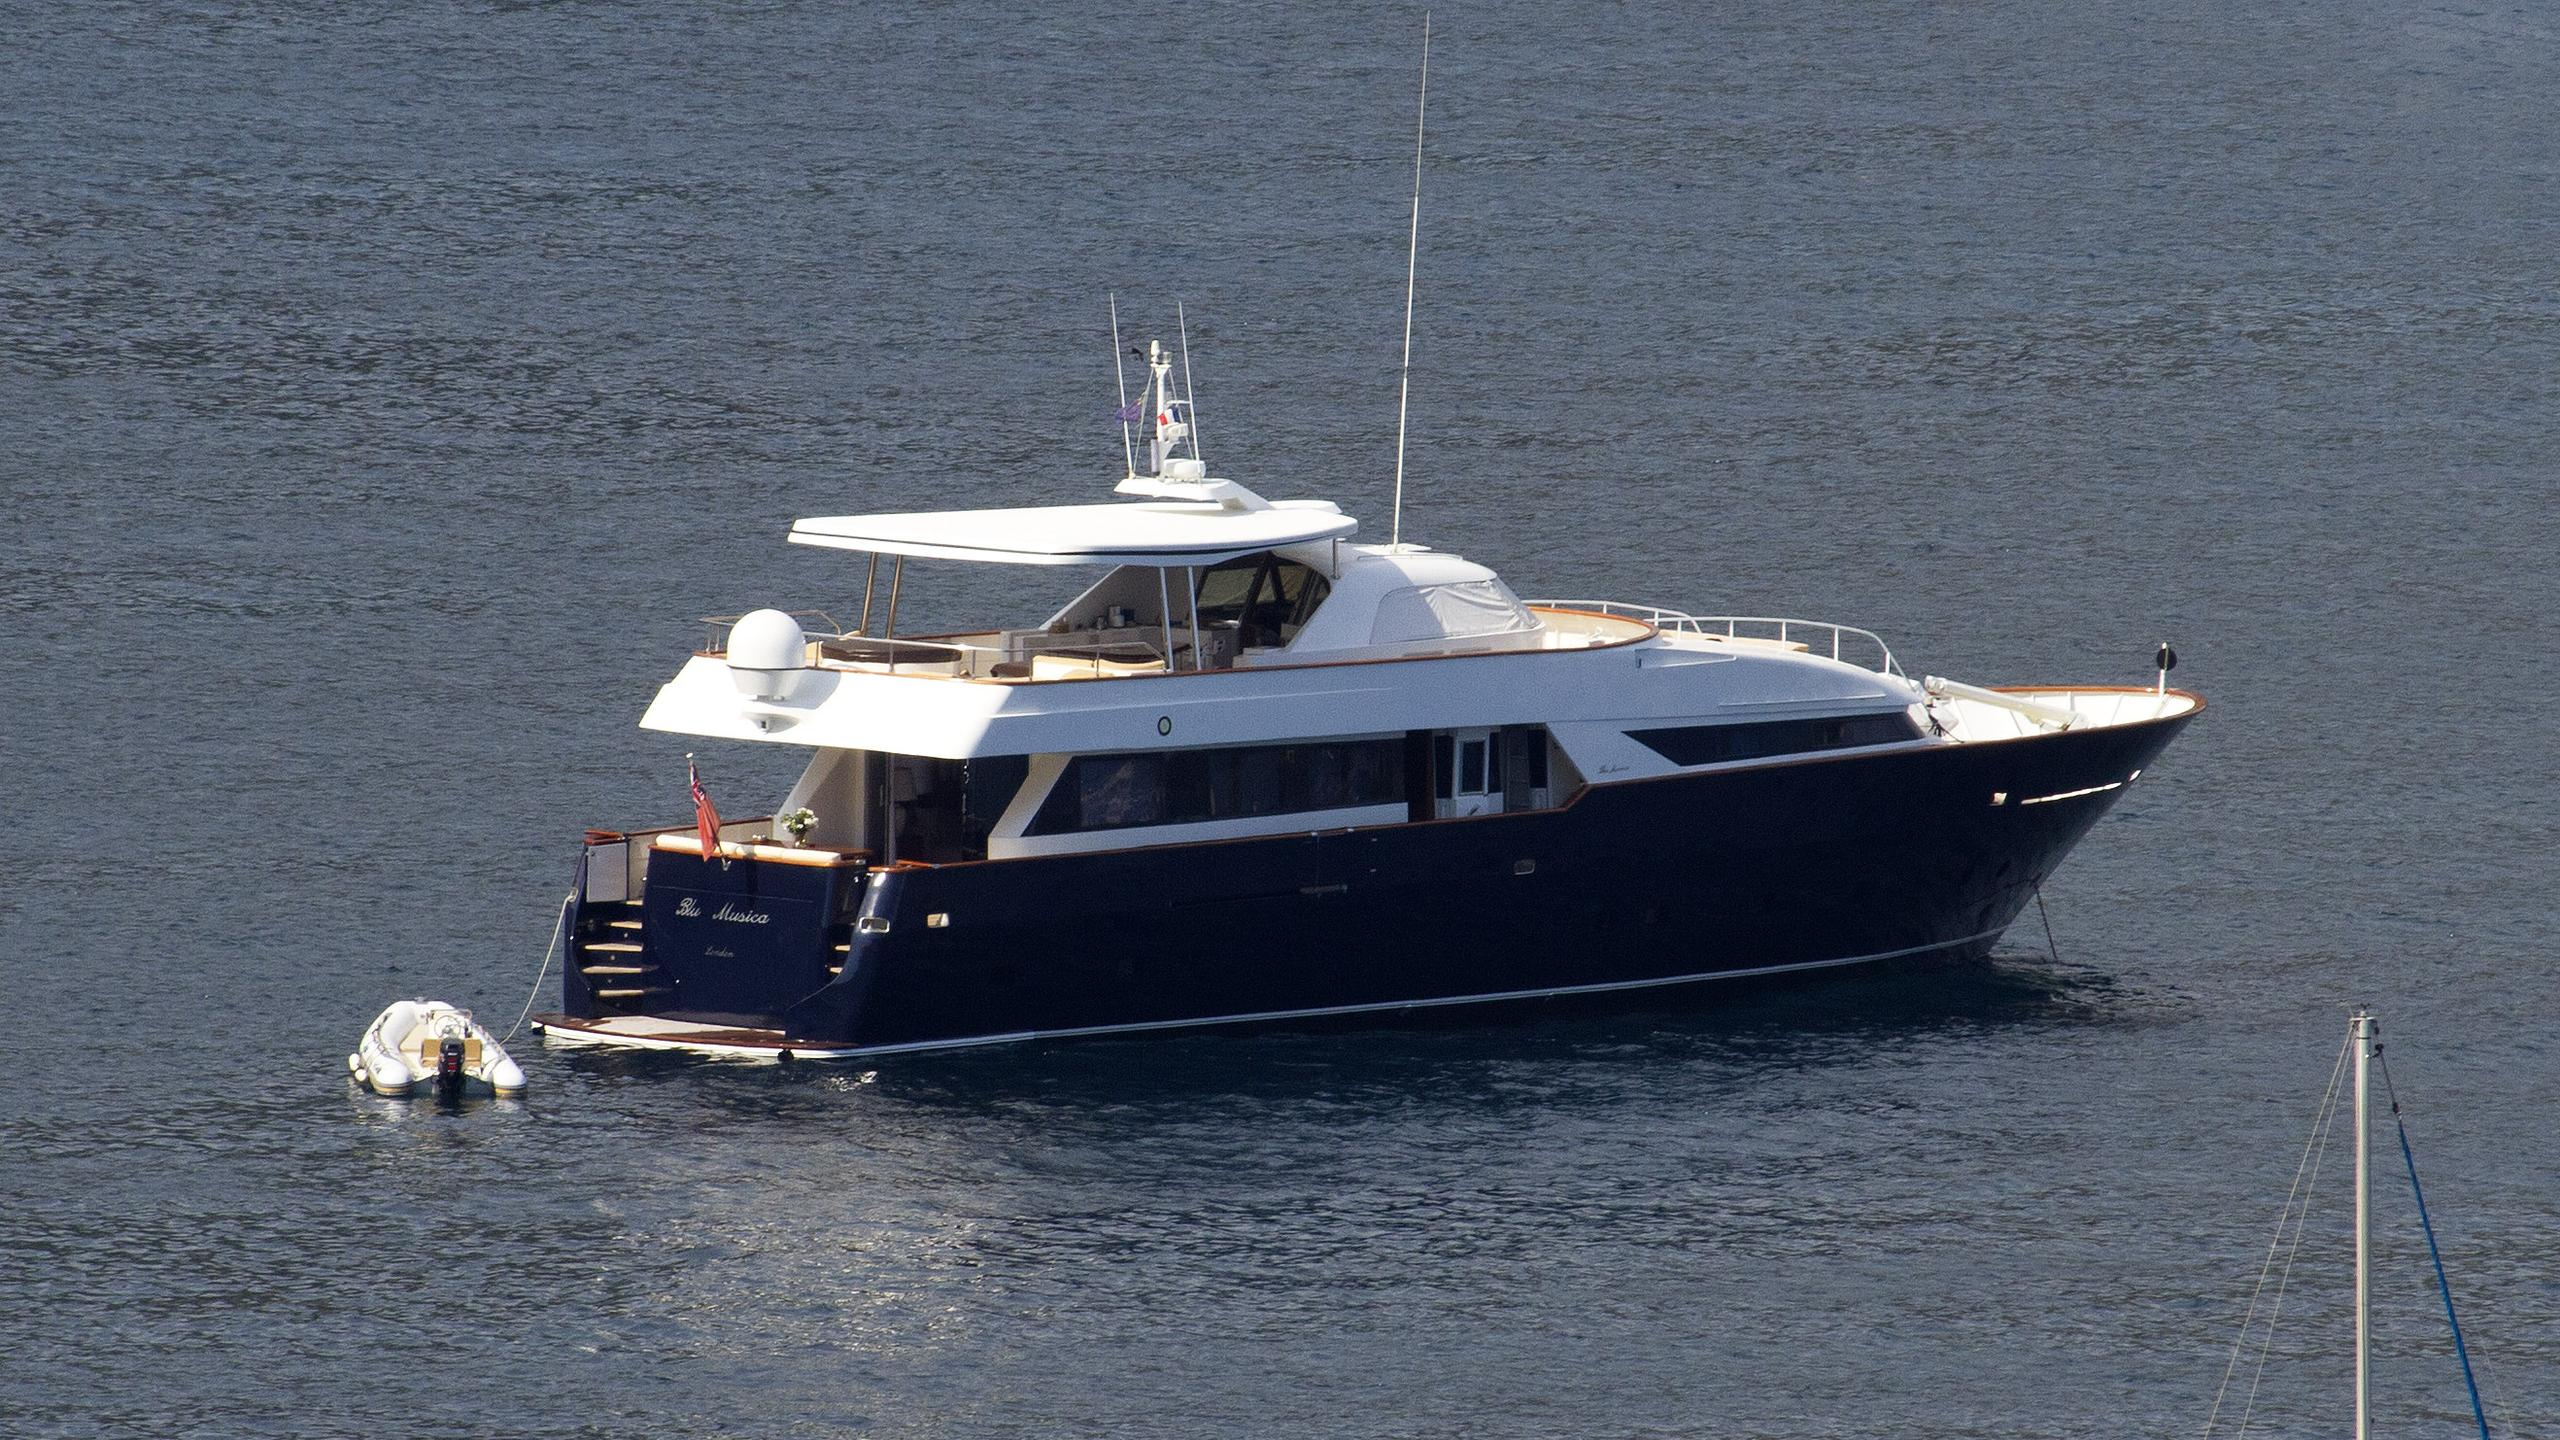 blu musica motoryacht cnsm 30m 1999 half stern